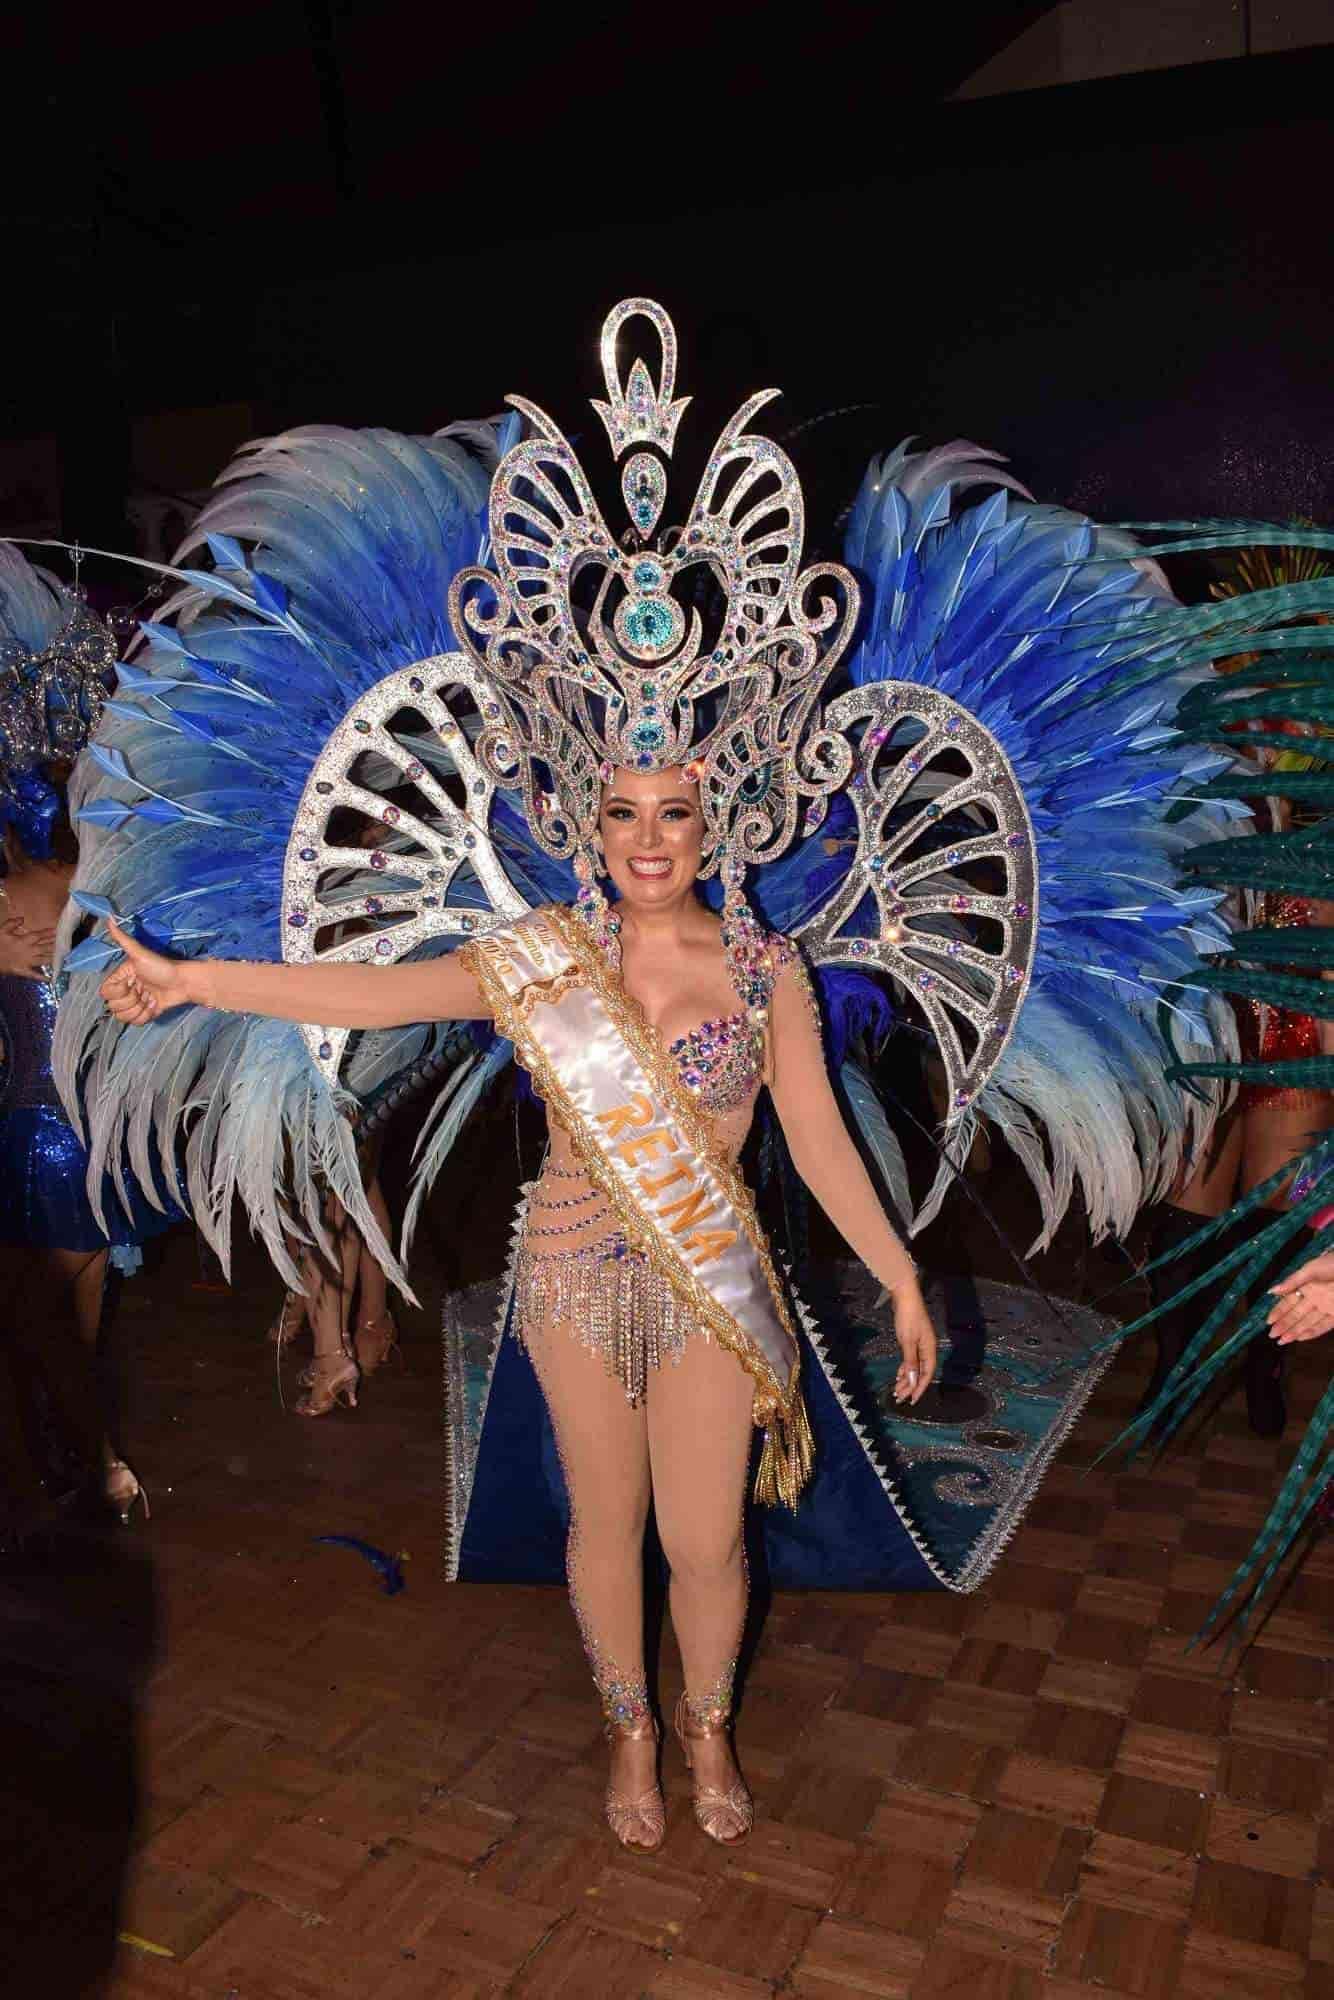 Tradicional Baile de Cigüeñas Edición No. 76